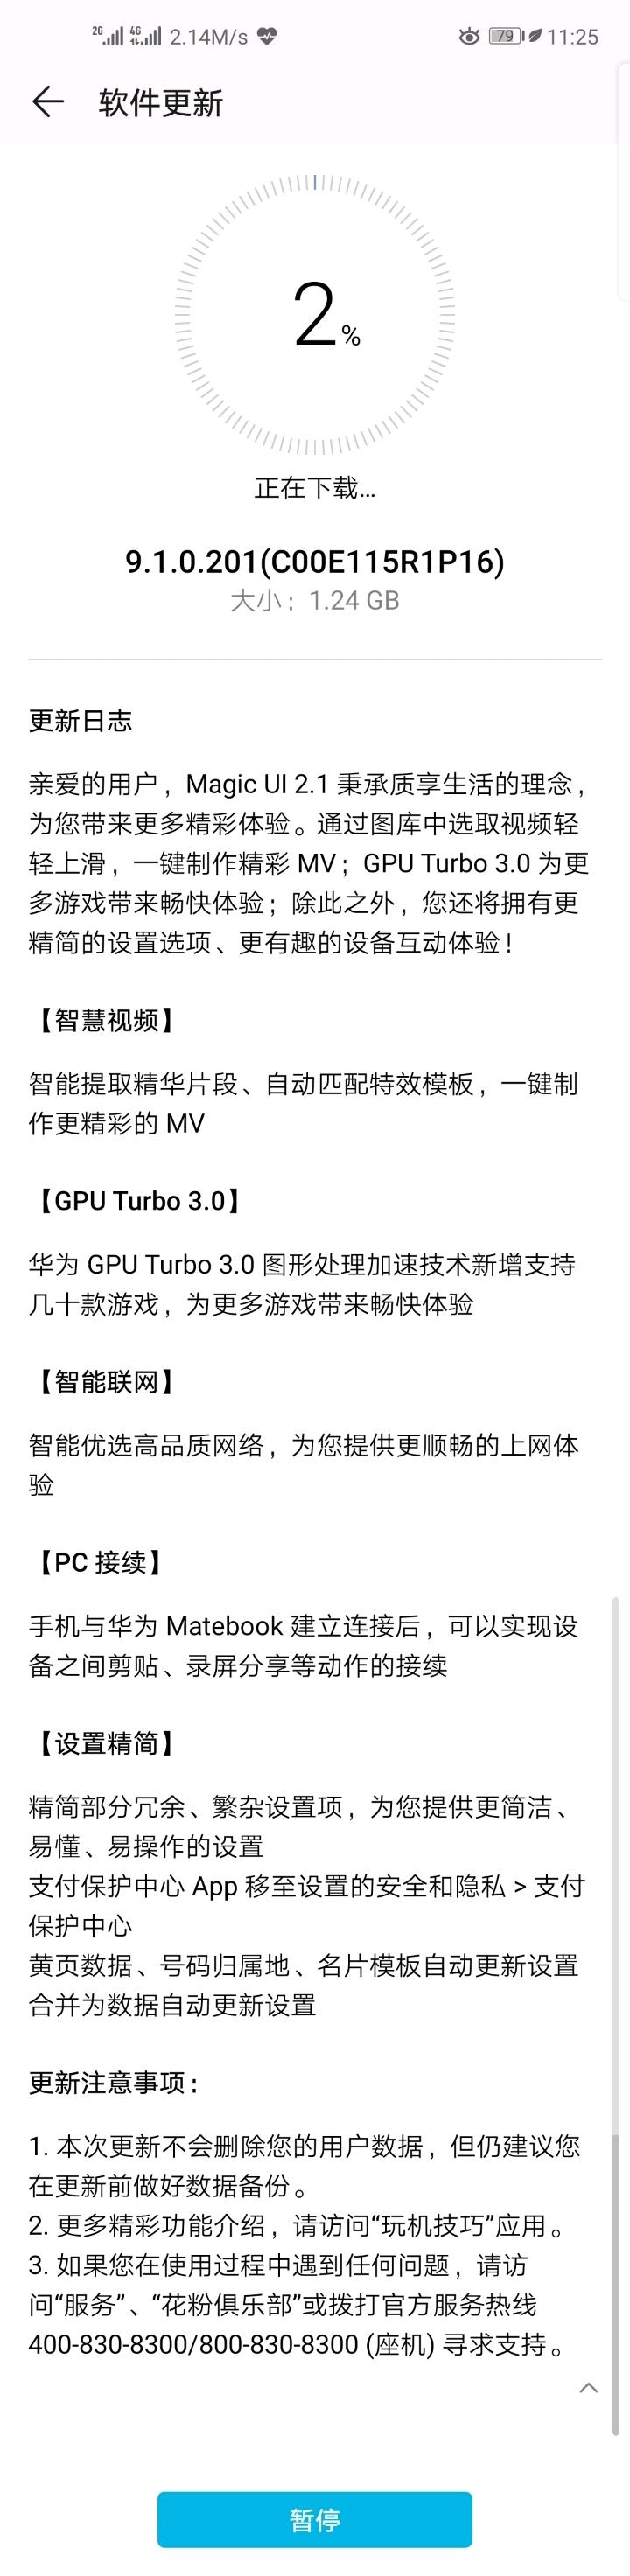 Screenshot_20190429_112550_com.huawei.android.hwouc.jpg